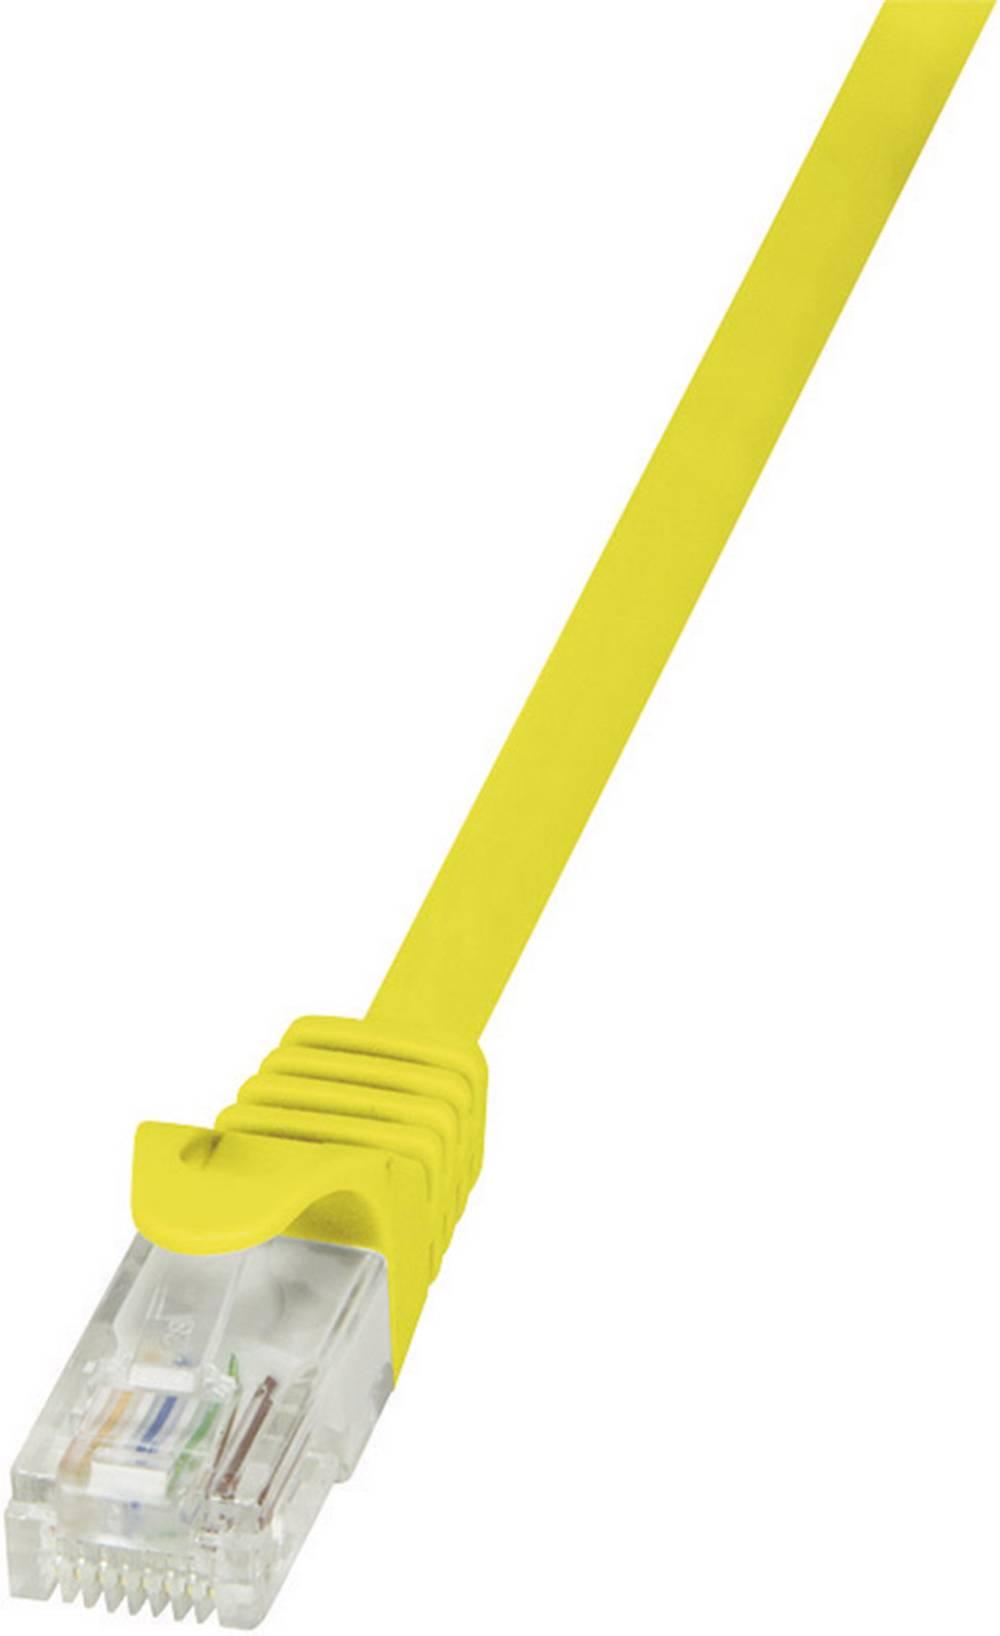 RJ45 omrežni kabel CAT 6 U/UTP [1x RJ45 konektor - 1x RJ45 konektor] 3 m rumena LogiLink CP2067U